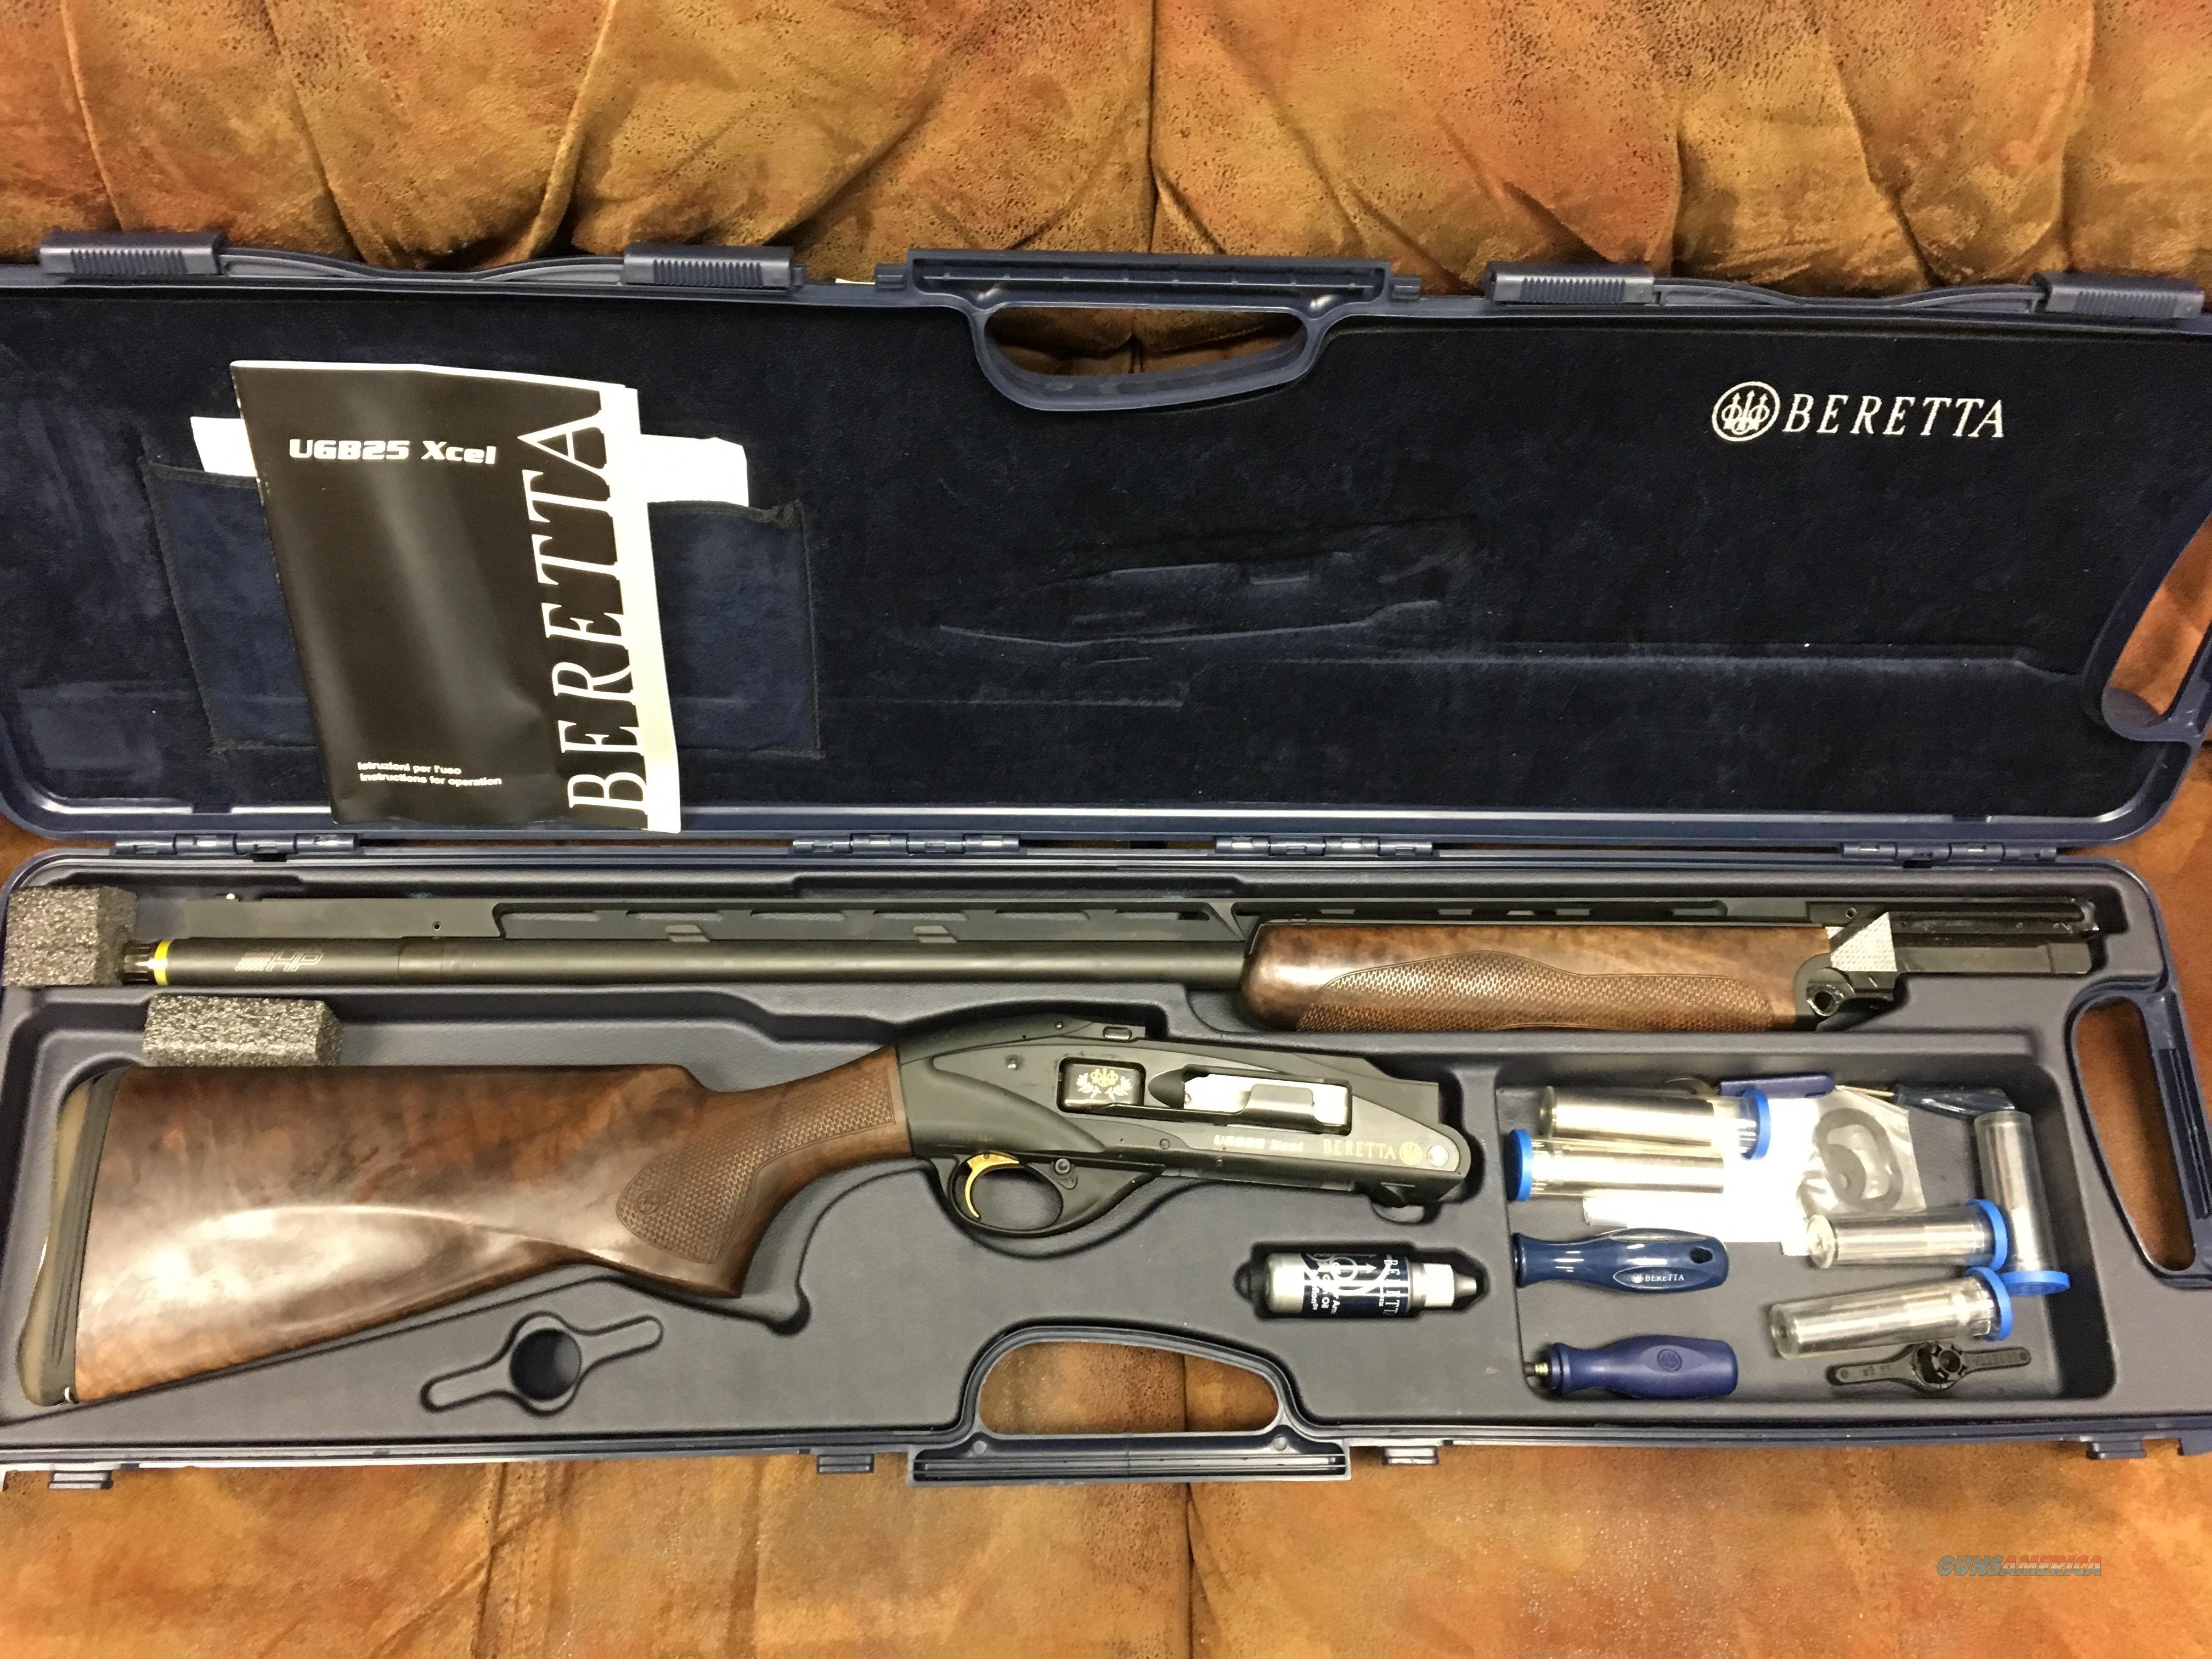 Beretta UGB25 Xcel Sporting  Guns > Shotguns > Beretta Shotguns > Single Barrel